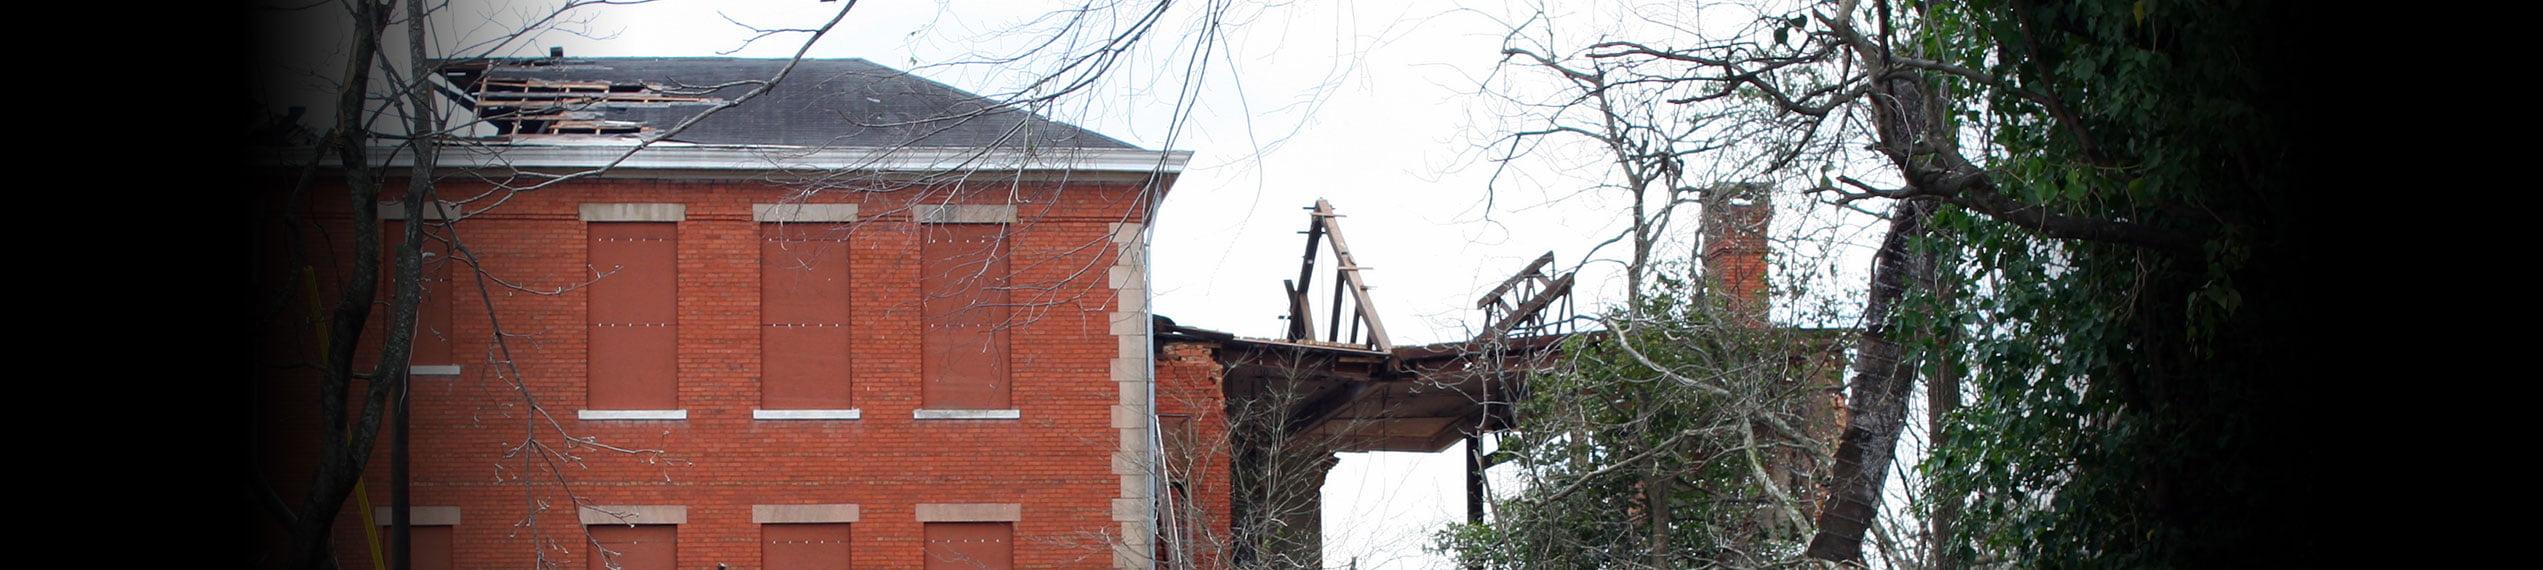 Wind & Storm Damage Repairs in Paul Davis Restoration of Northern Vermont